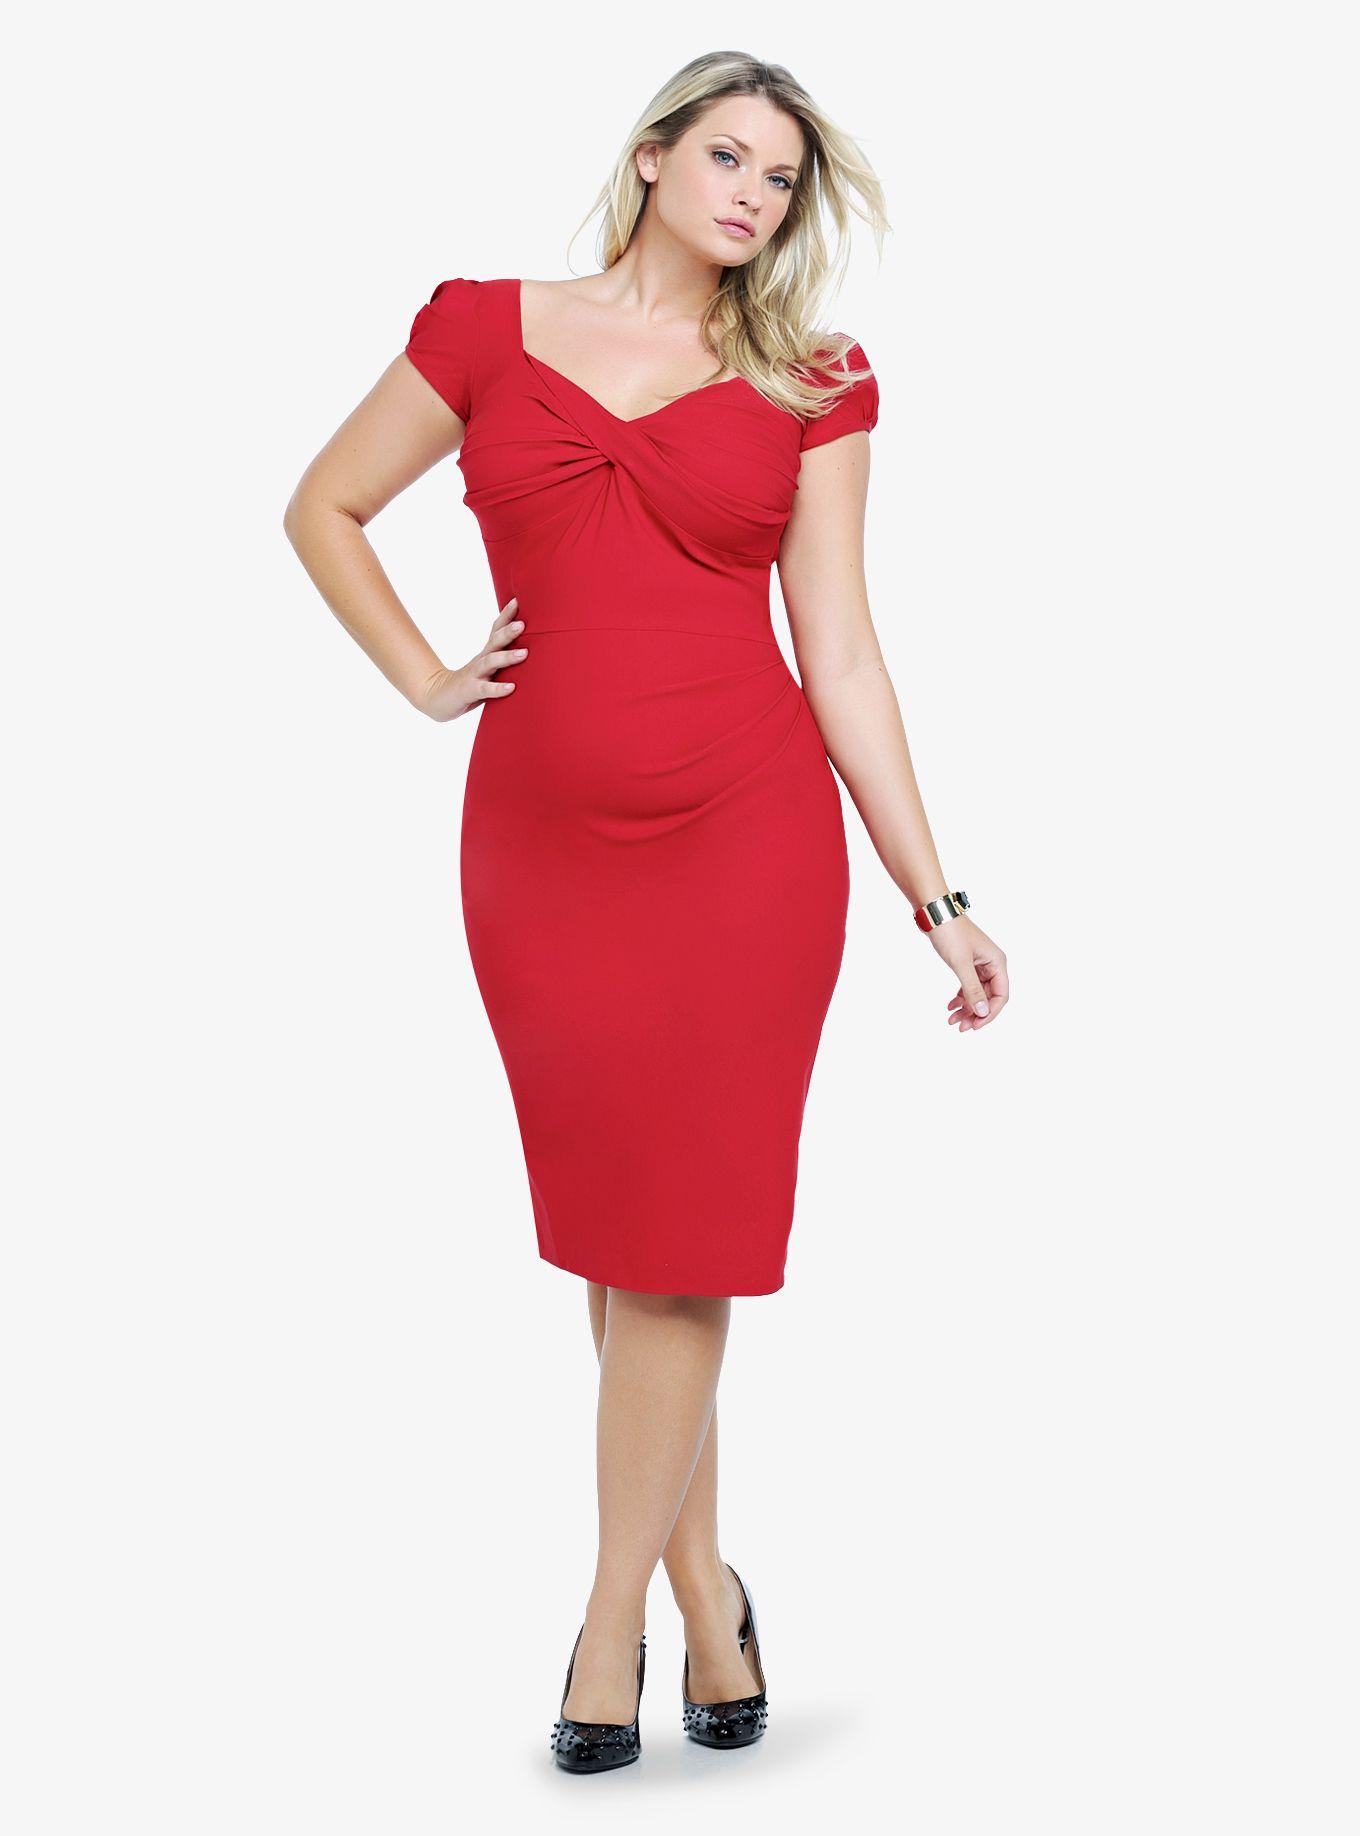 e776bdf21b4 This red dress is SOO stunning!  HaveATorridAffair